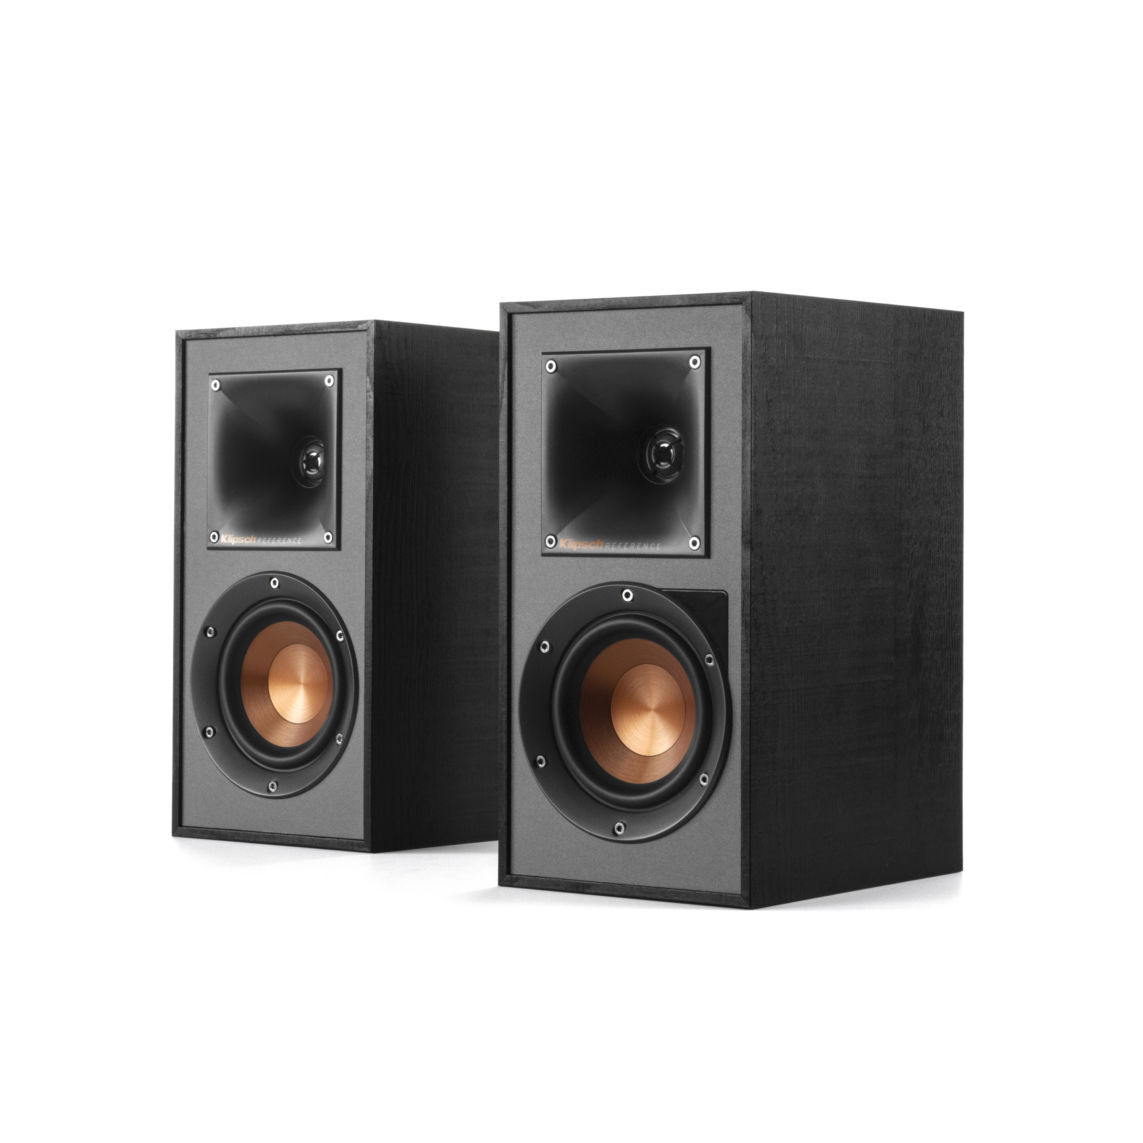 Полочная акустика Klipsch Reference R-41PM black